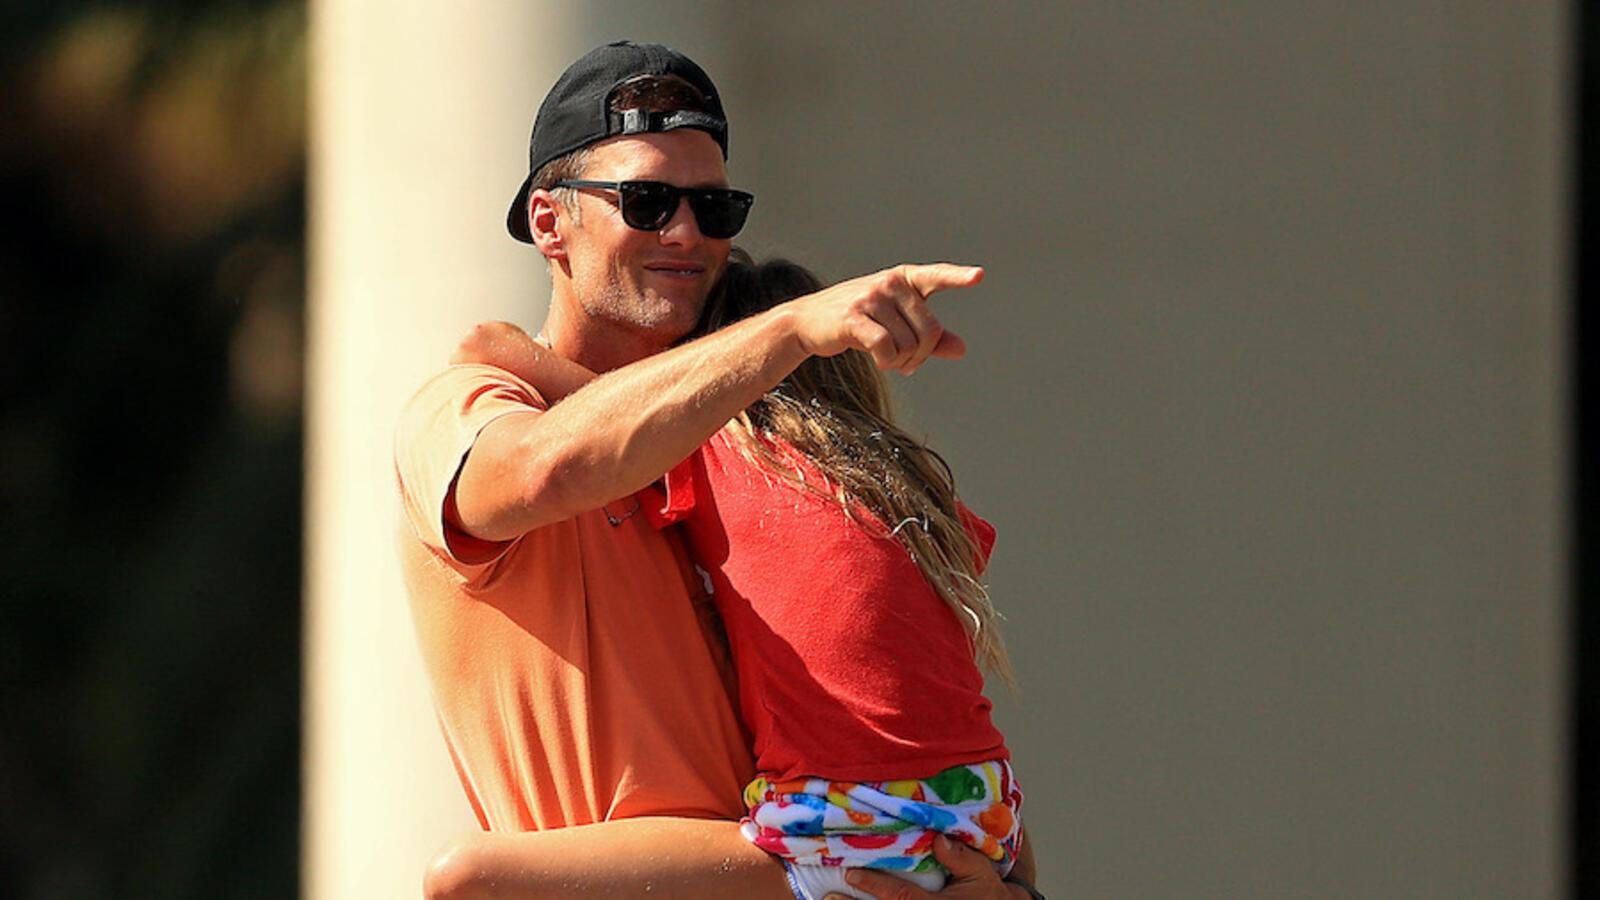 WATCH: Brady Sends A Message To Rodgers, DeChambeau Ahead Of 'The Match'